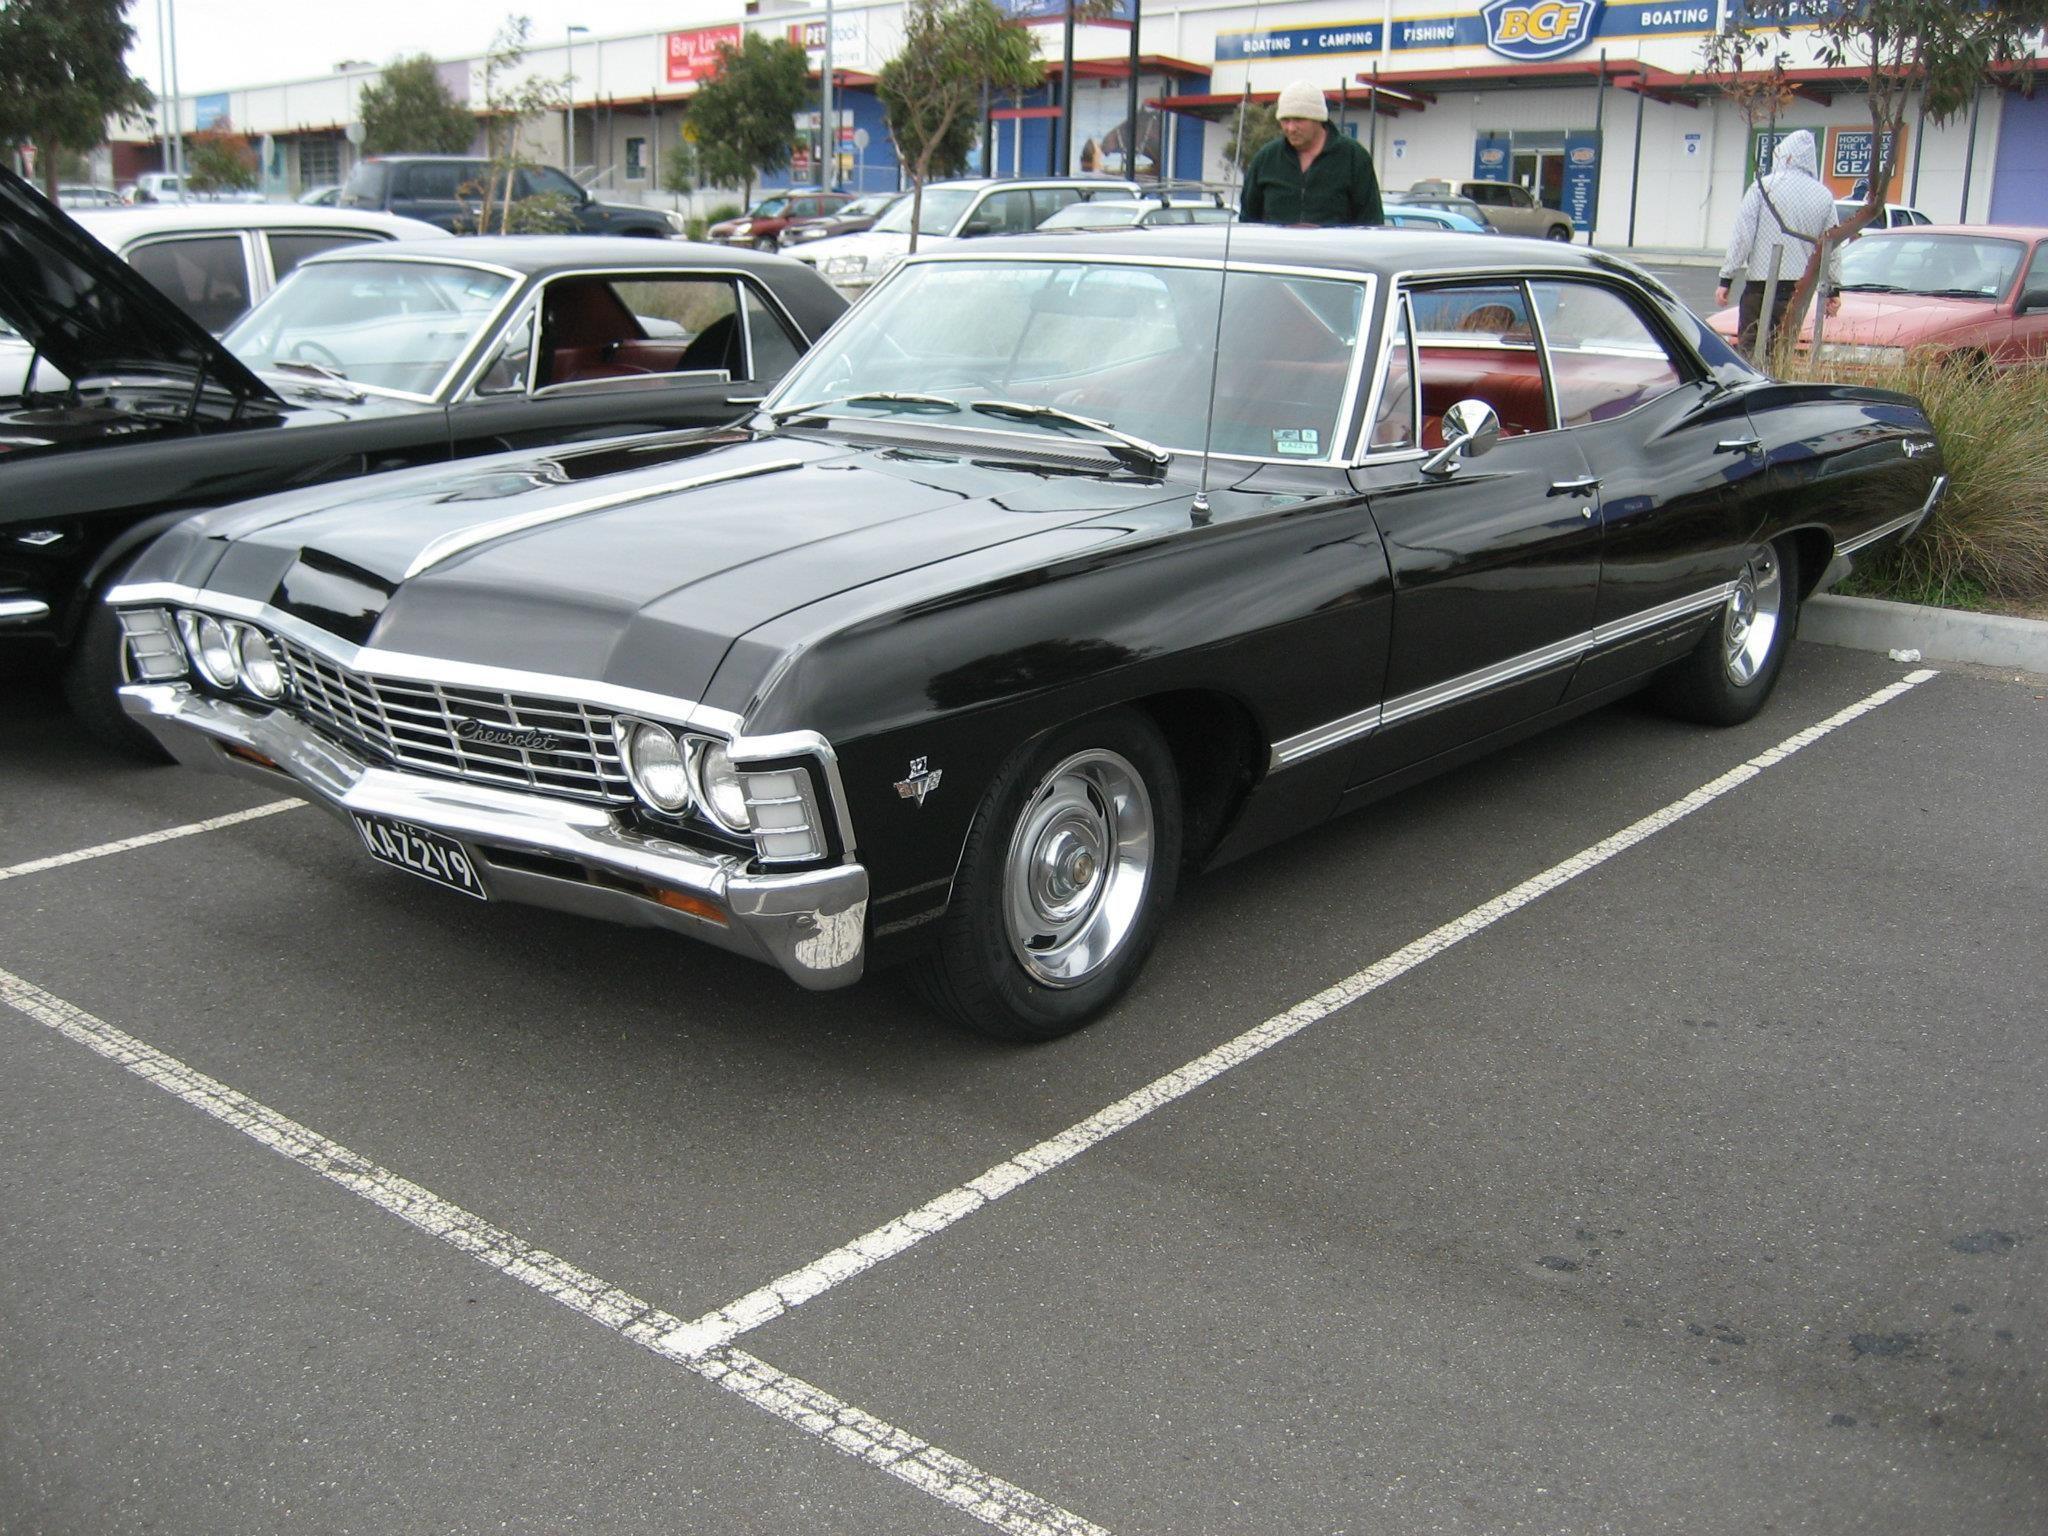 1967 Chevy Impala Chevrolet Impala Chevrolet Impala 1967 Chevy Chevrolet